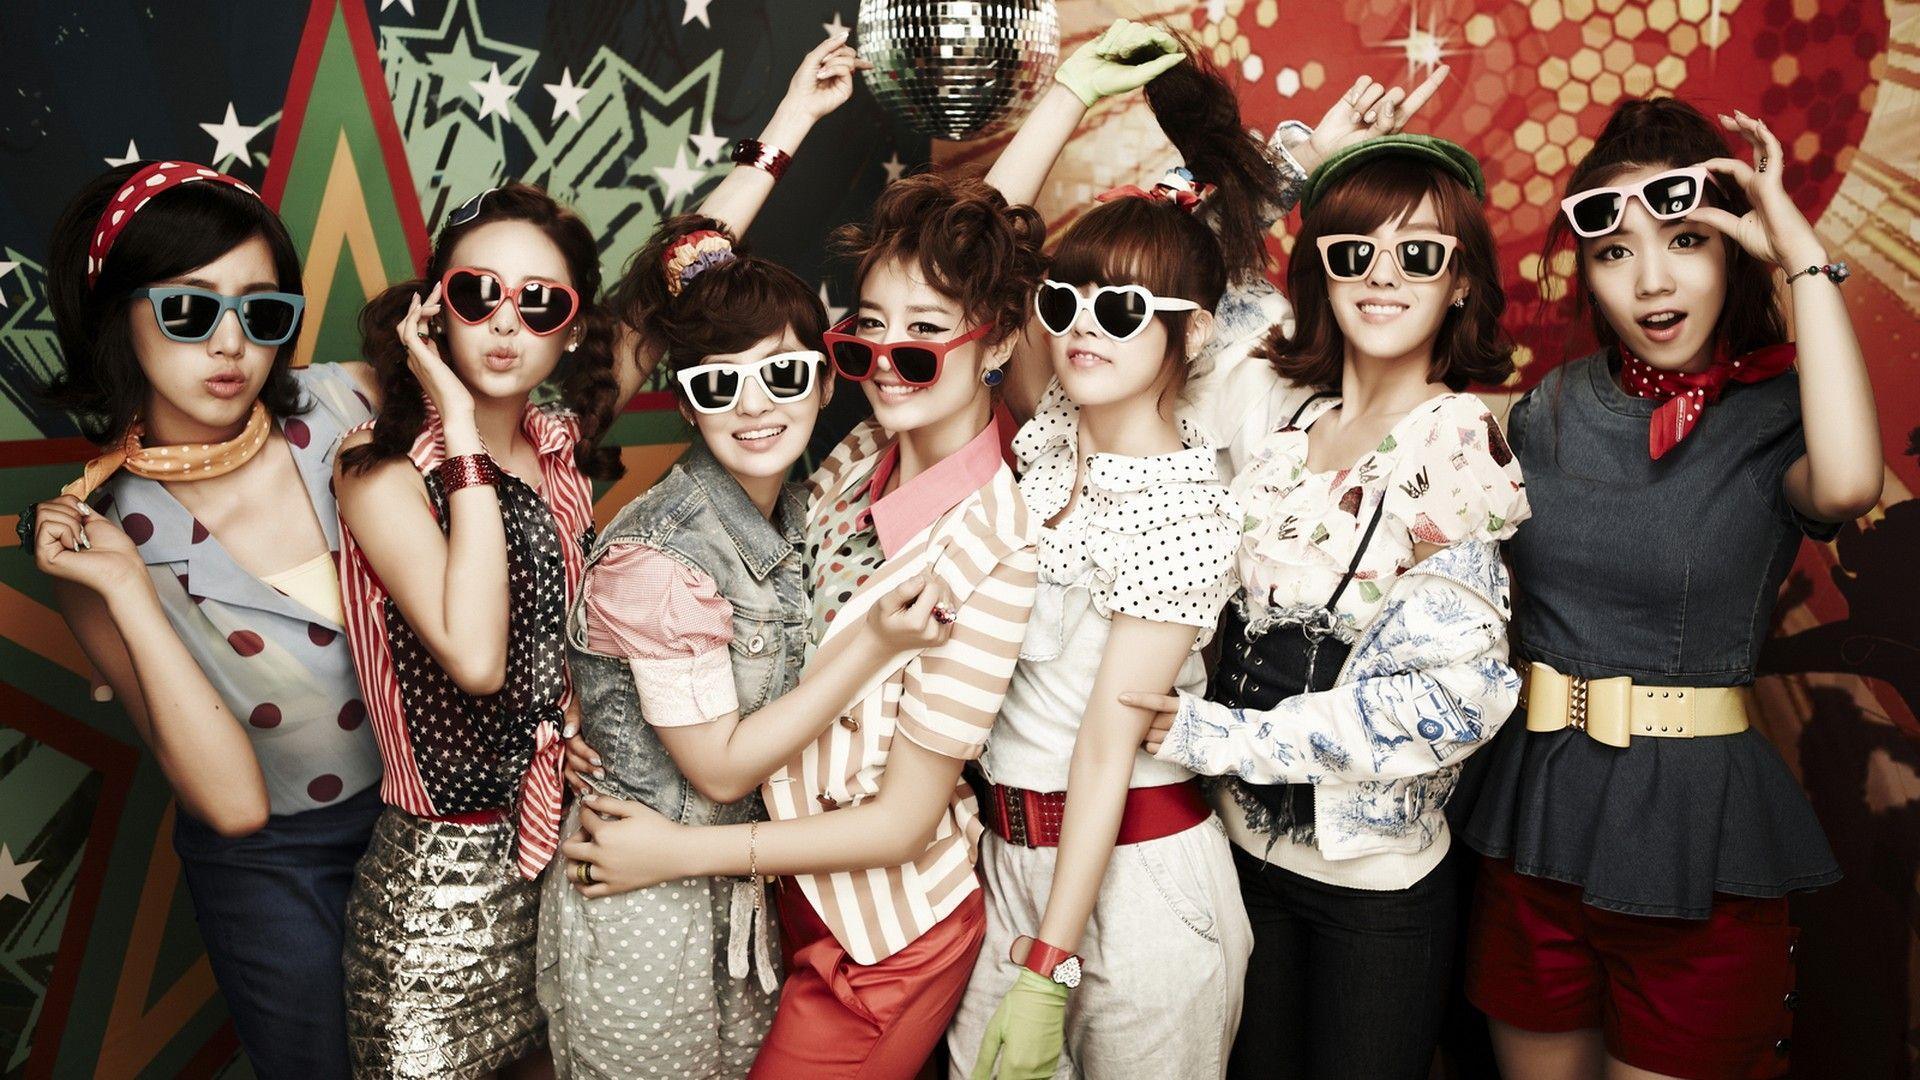 Women Music Asians Korean Korea K Pop T Ara Wallpaper 2190332 Wallbase Cc Tara Halloween Fashion Ara